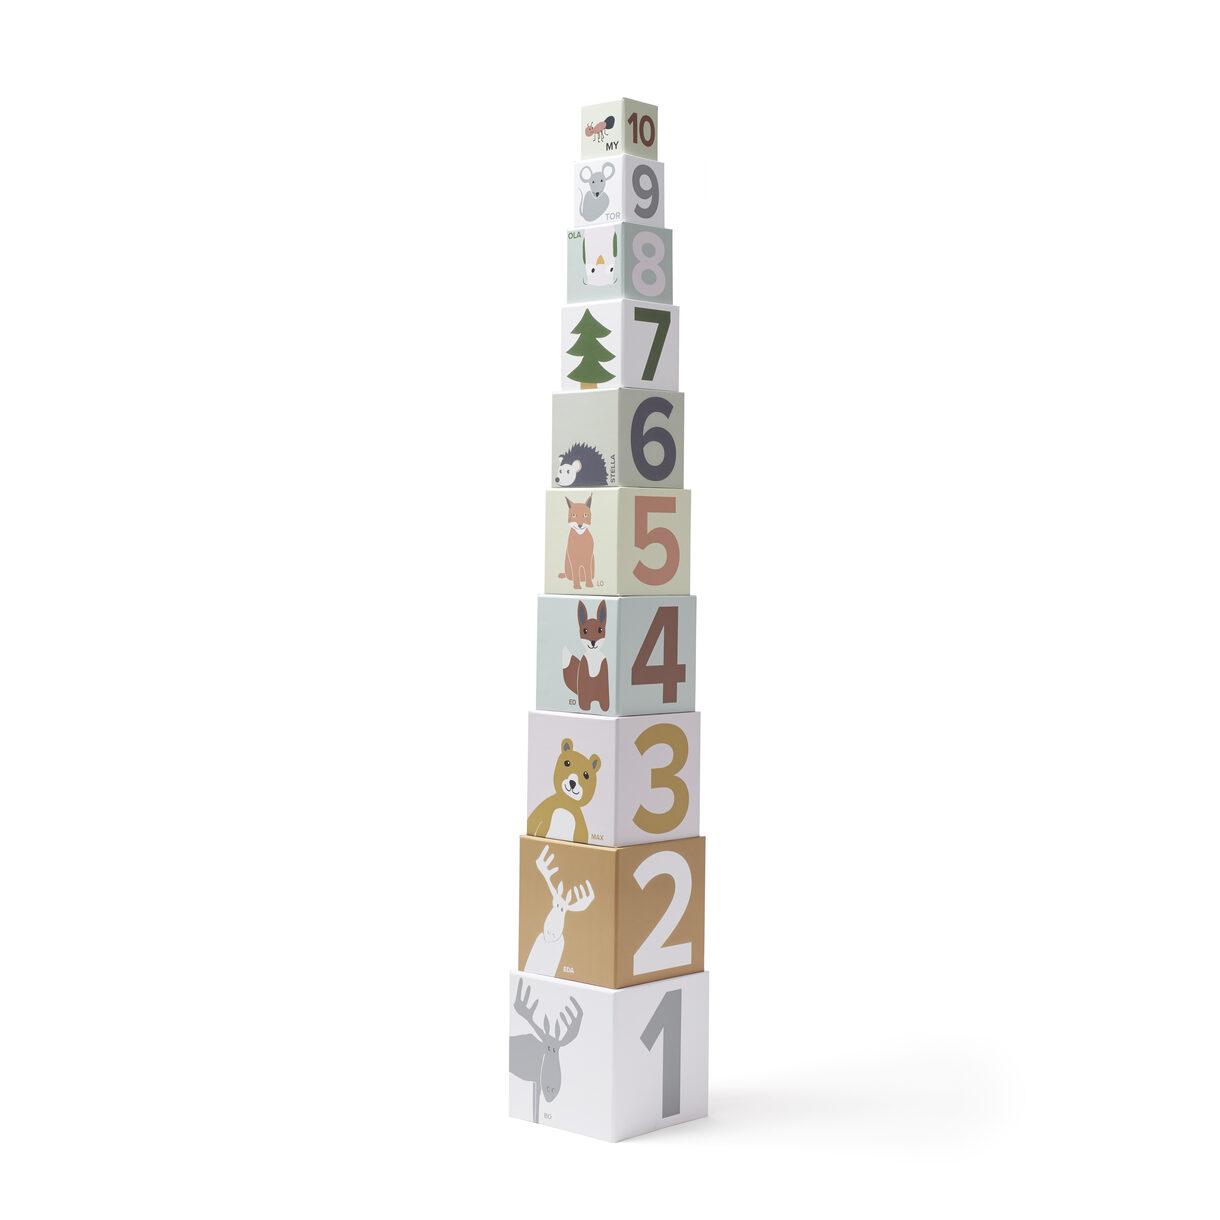 Stabletårn i Papir 1-10 - Edvin